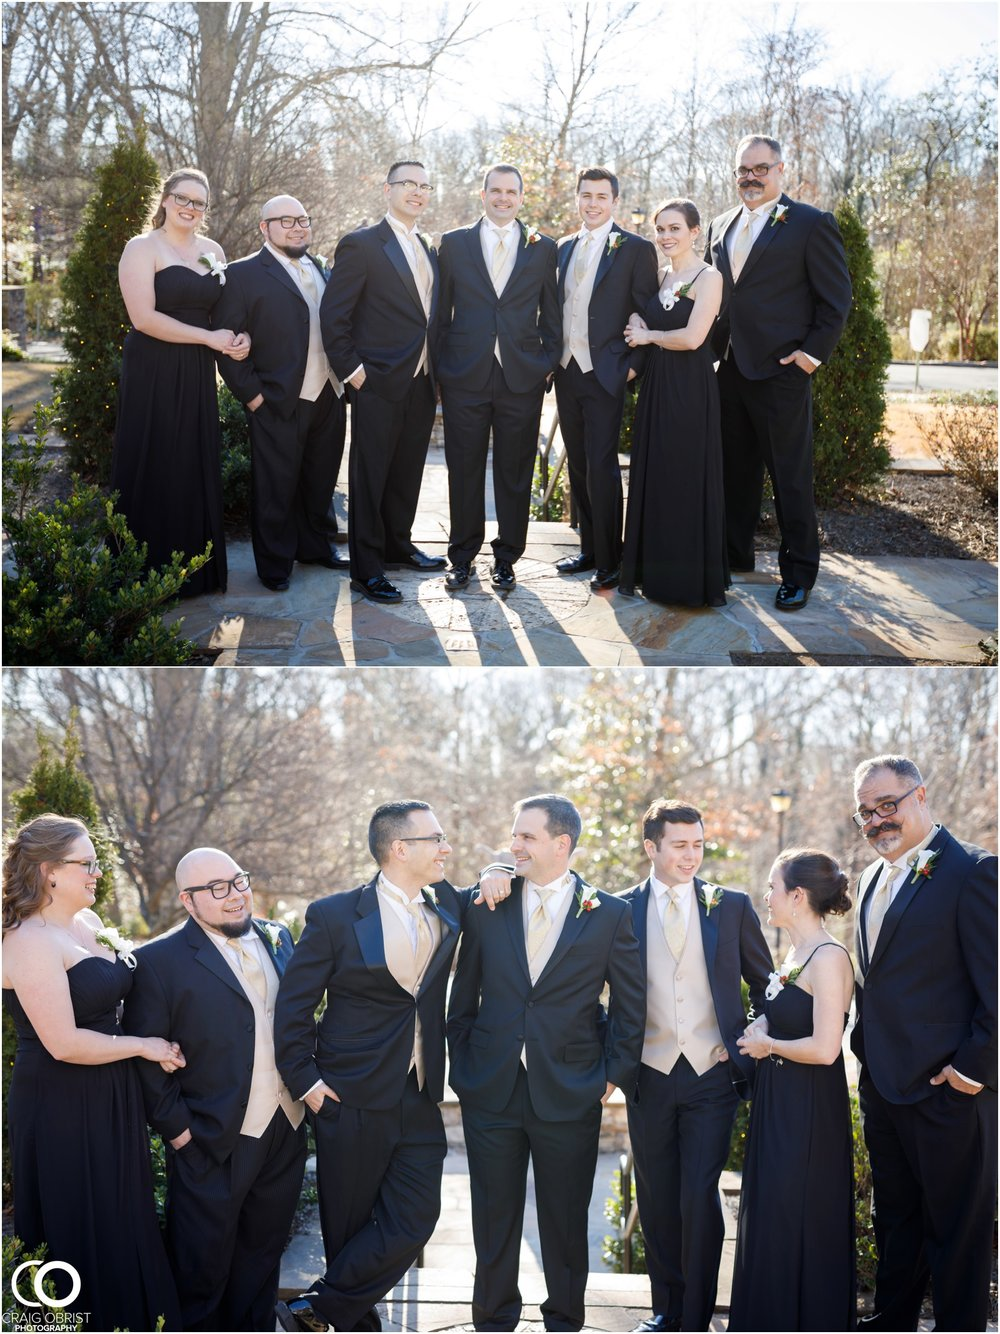 Callanwolde-Fine-Arts-Center Wedding Atlanta Georgia Dec 2017_0041.jpg